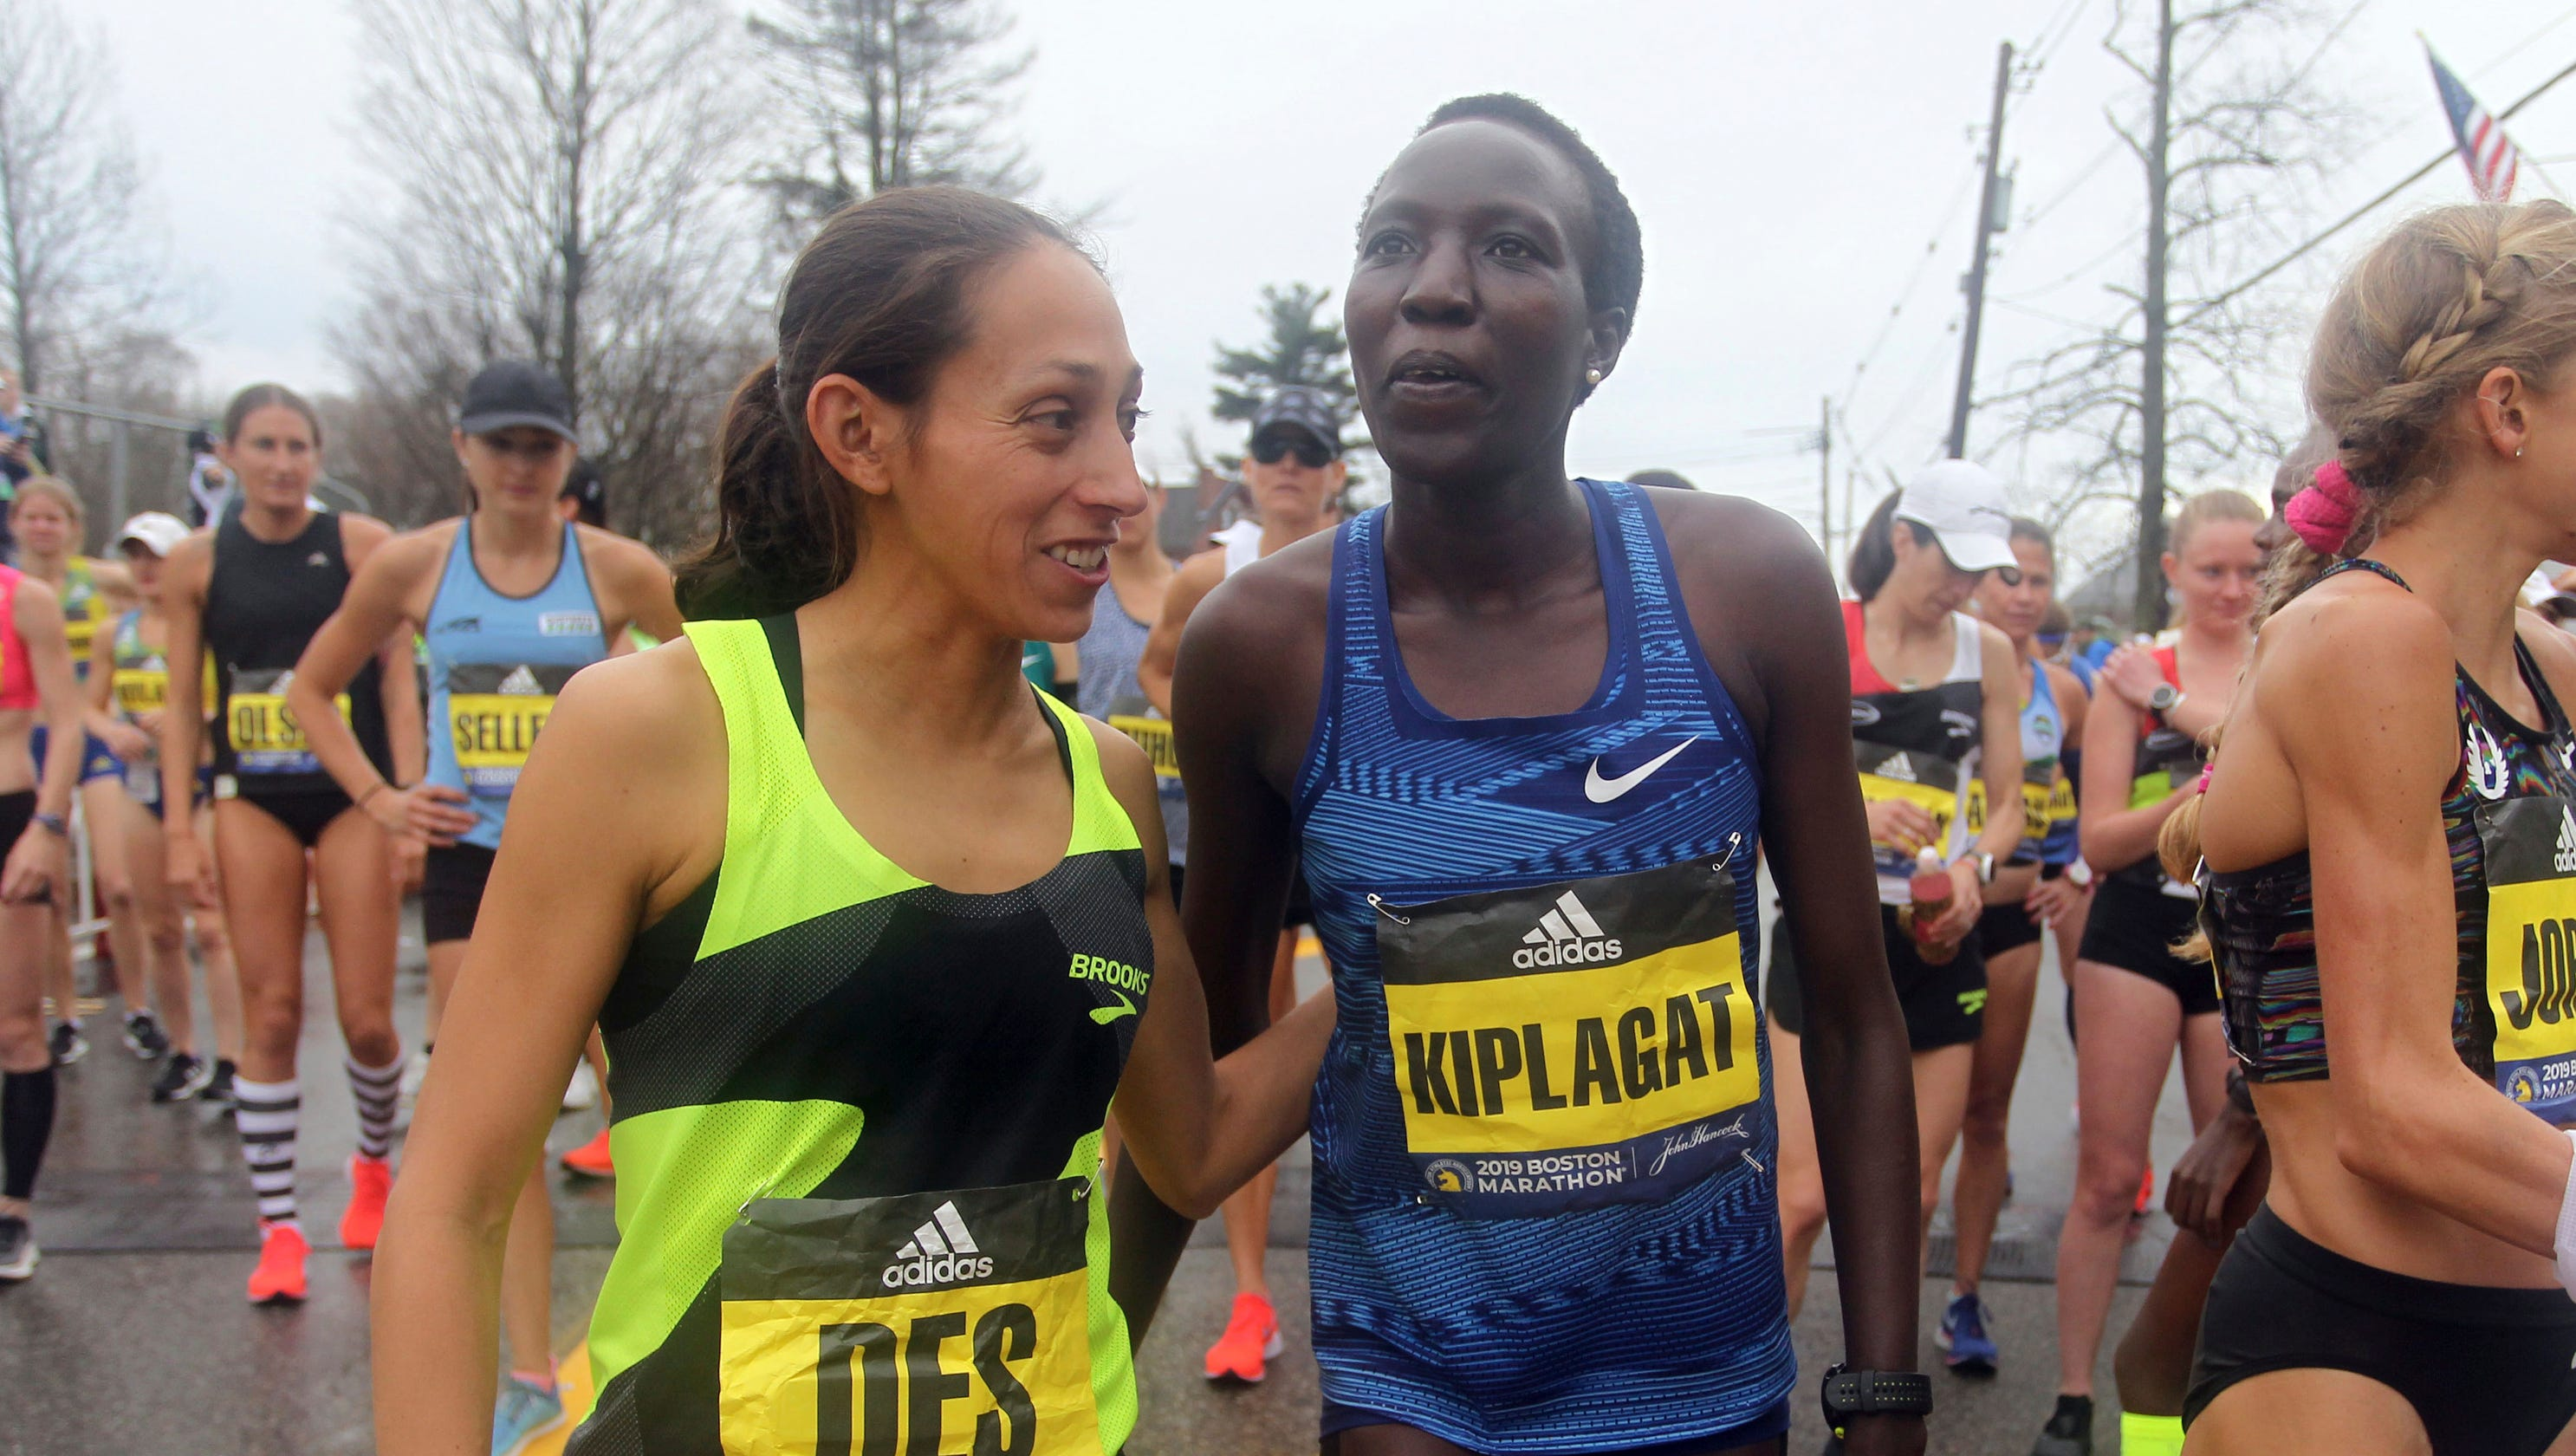 c72f6bf36b3 Boston Marathon  Defending champion Desiree Linden finishes fifth